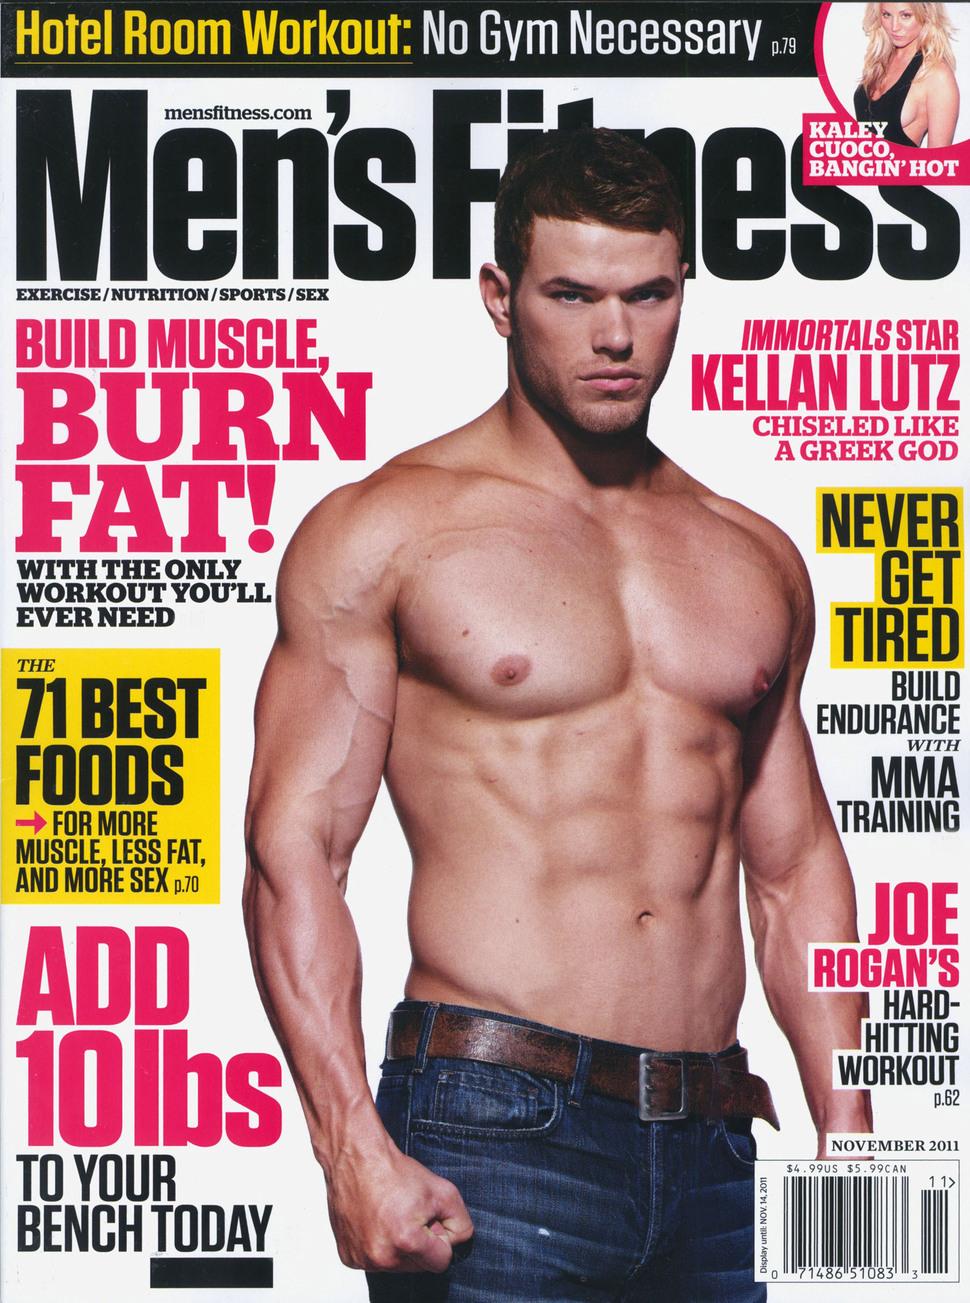 Видео: Келлан Латс на съемках для журнала Men's Fitness